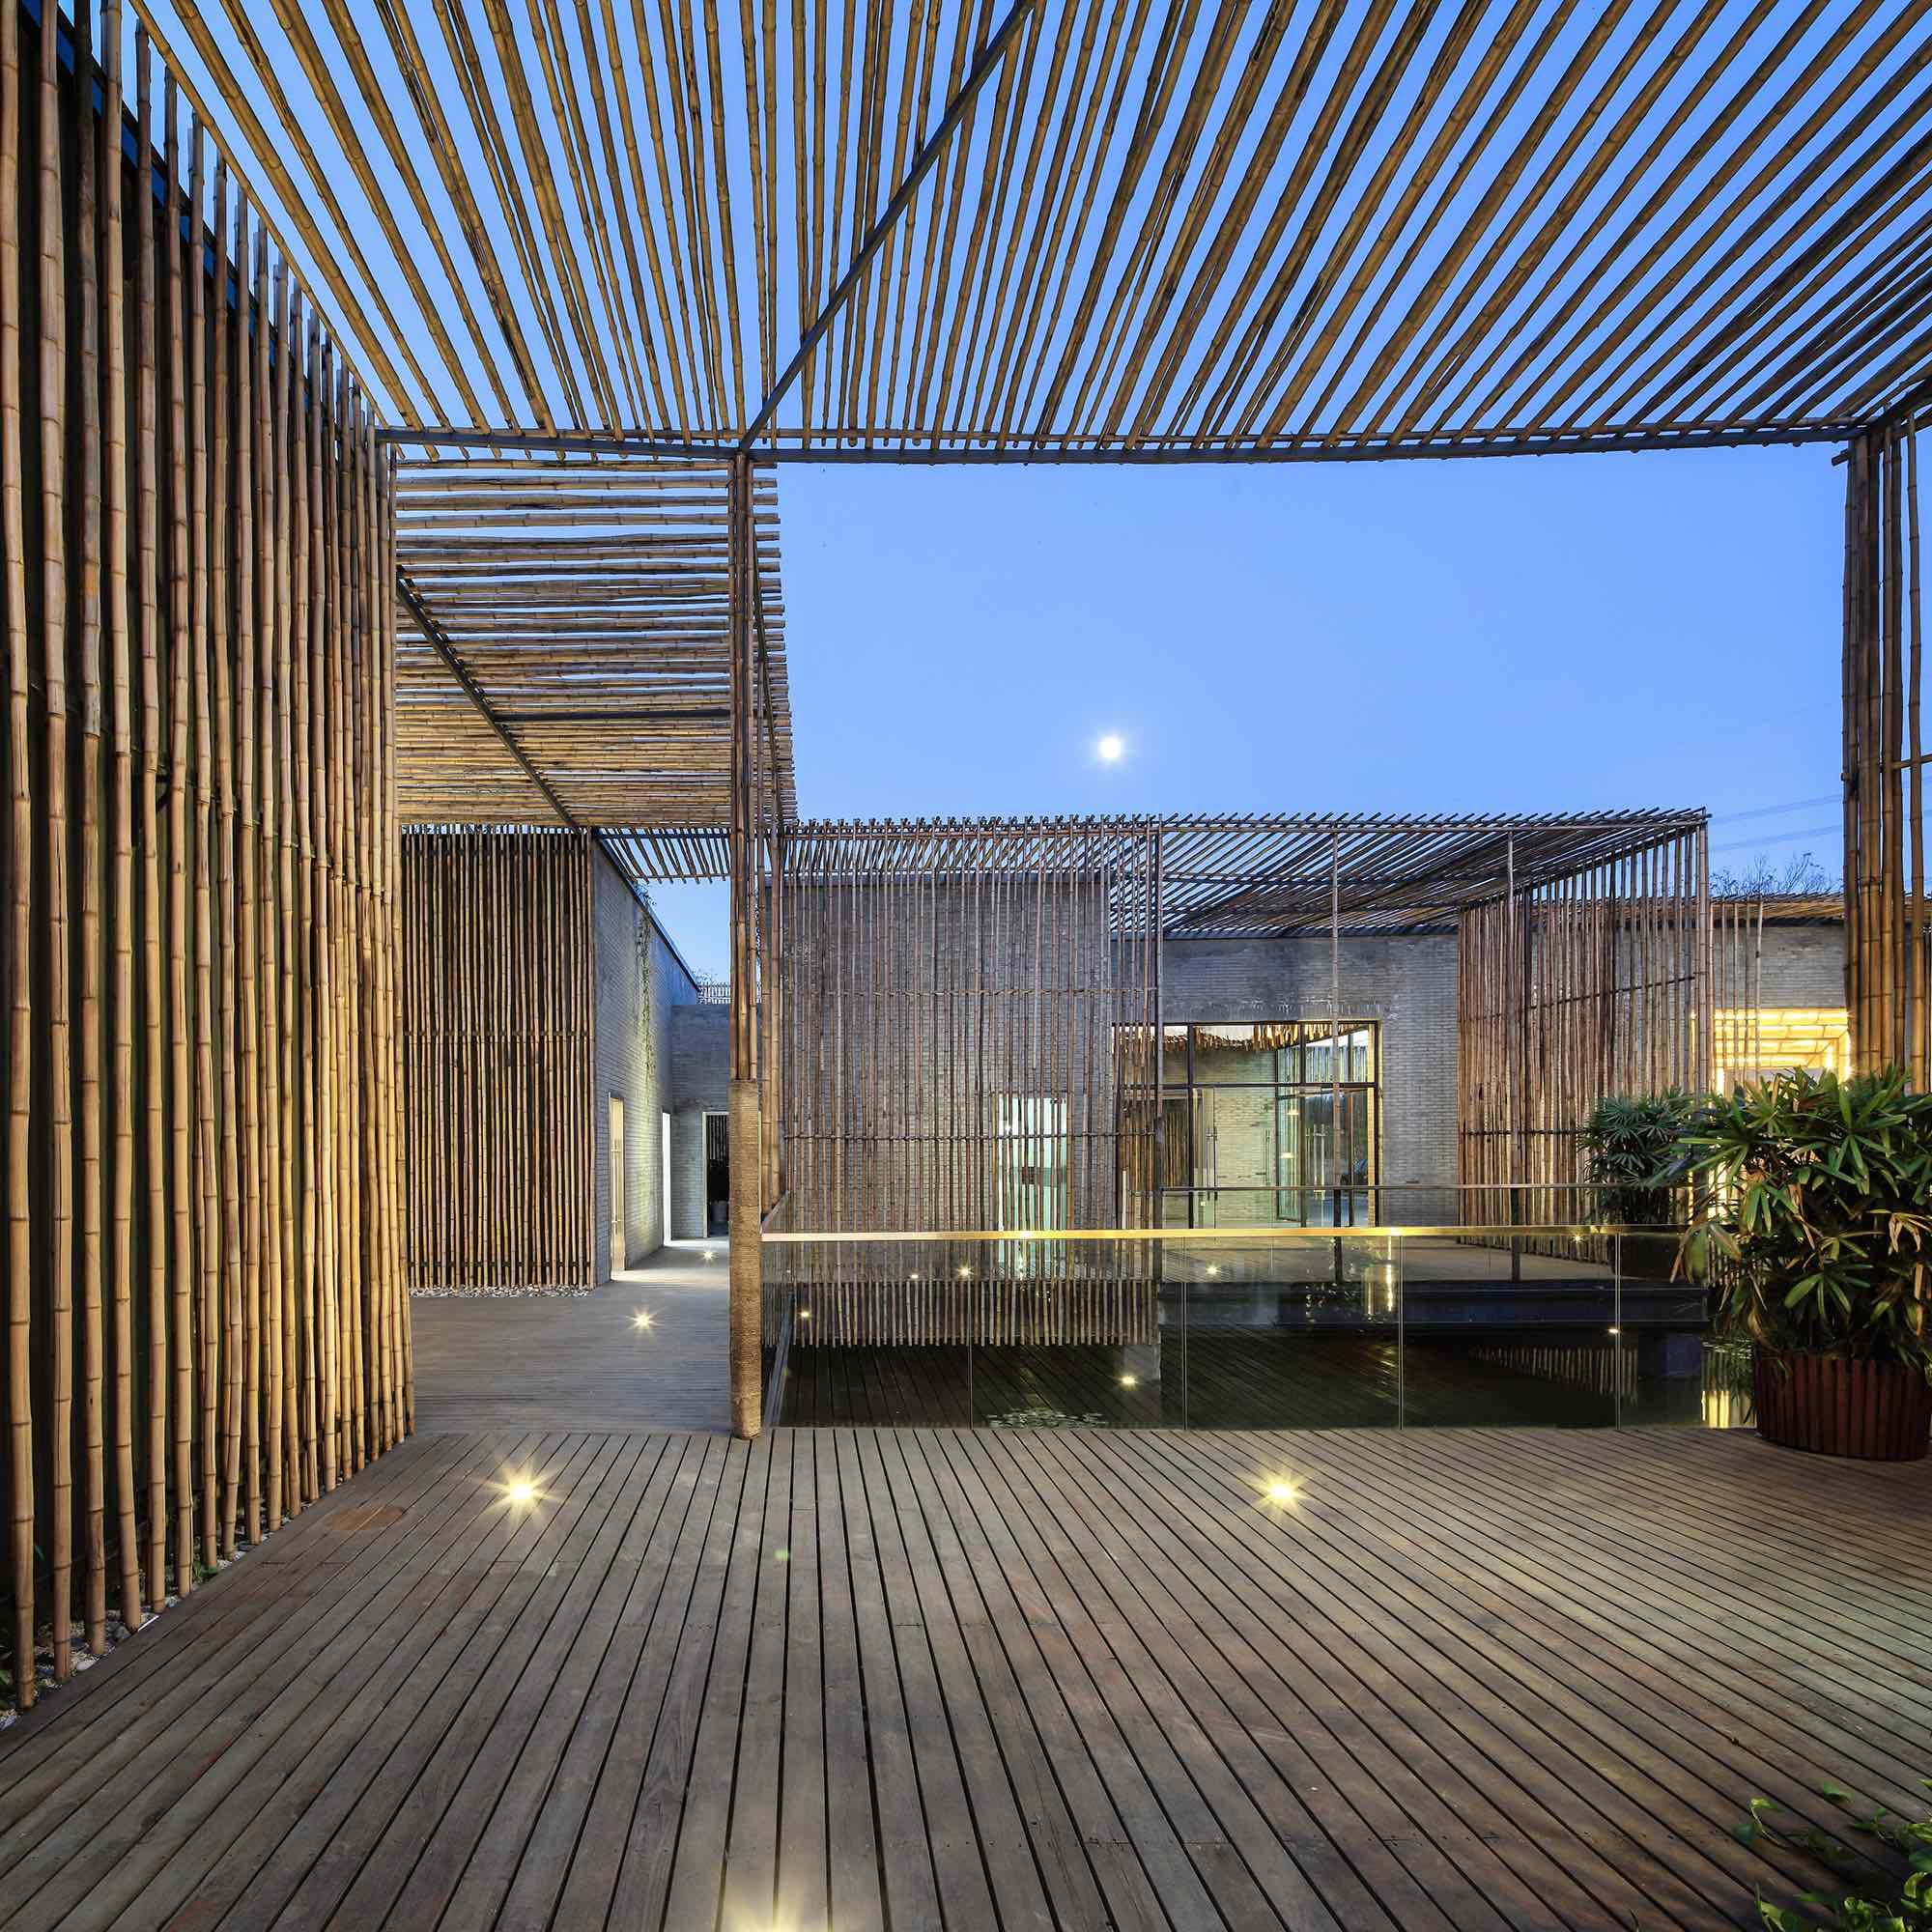 Bamboo Courtyard Teahouse By Hwcd Caandesign